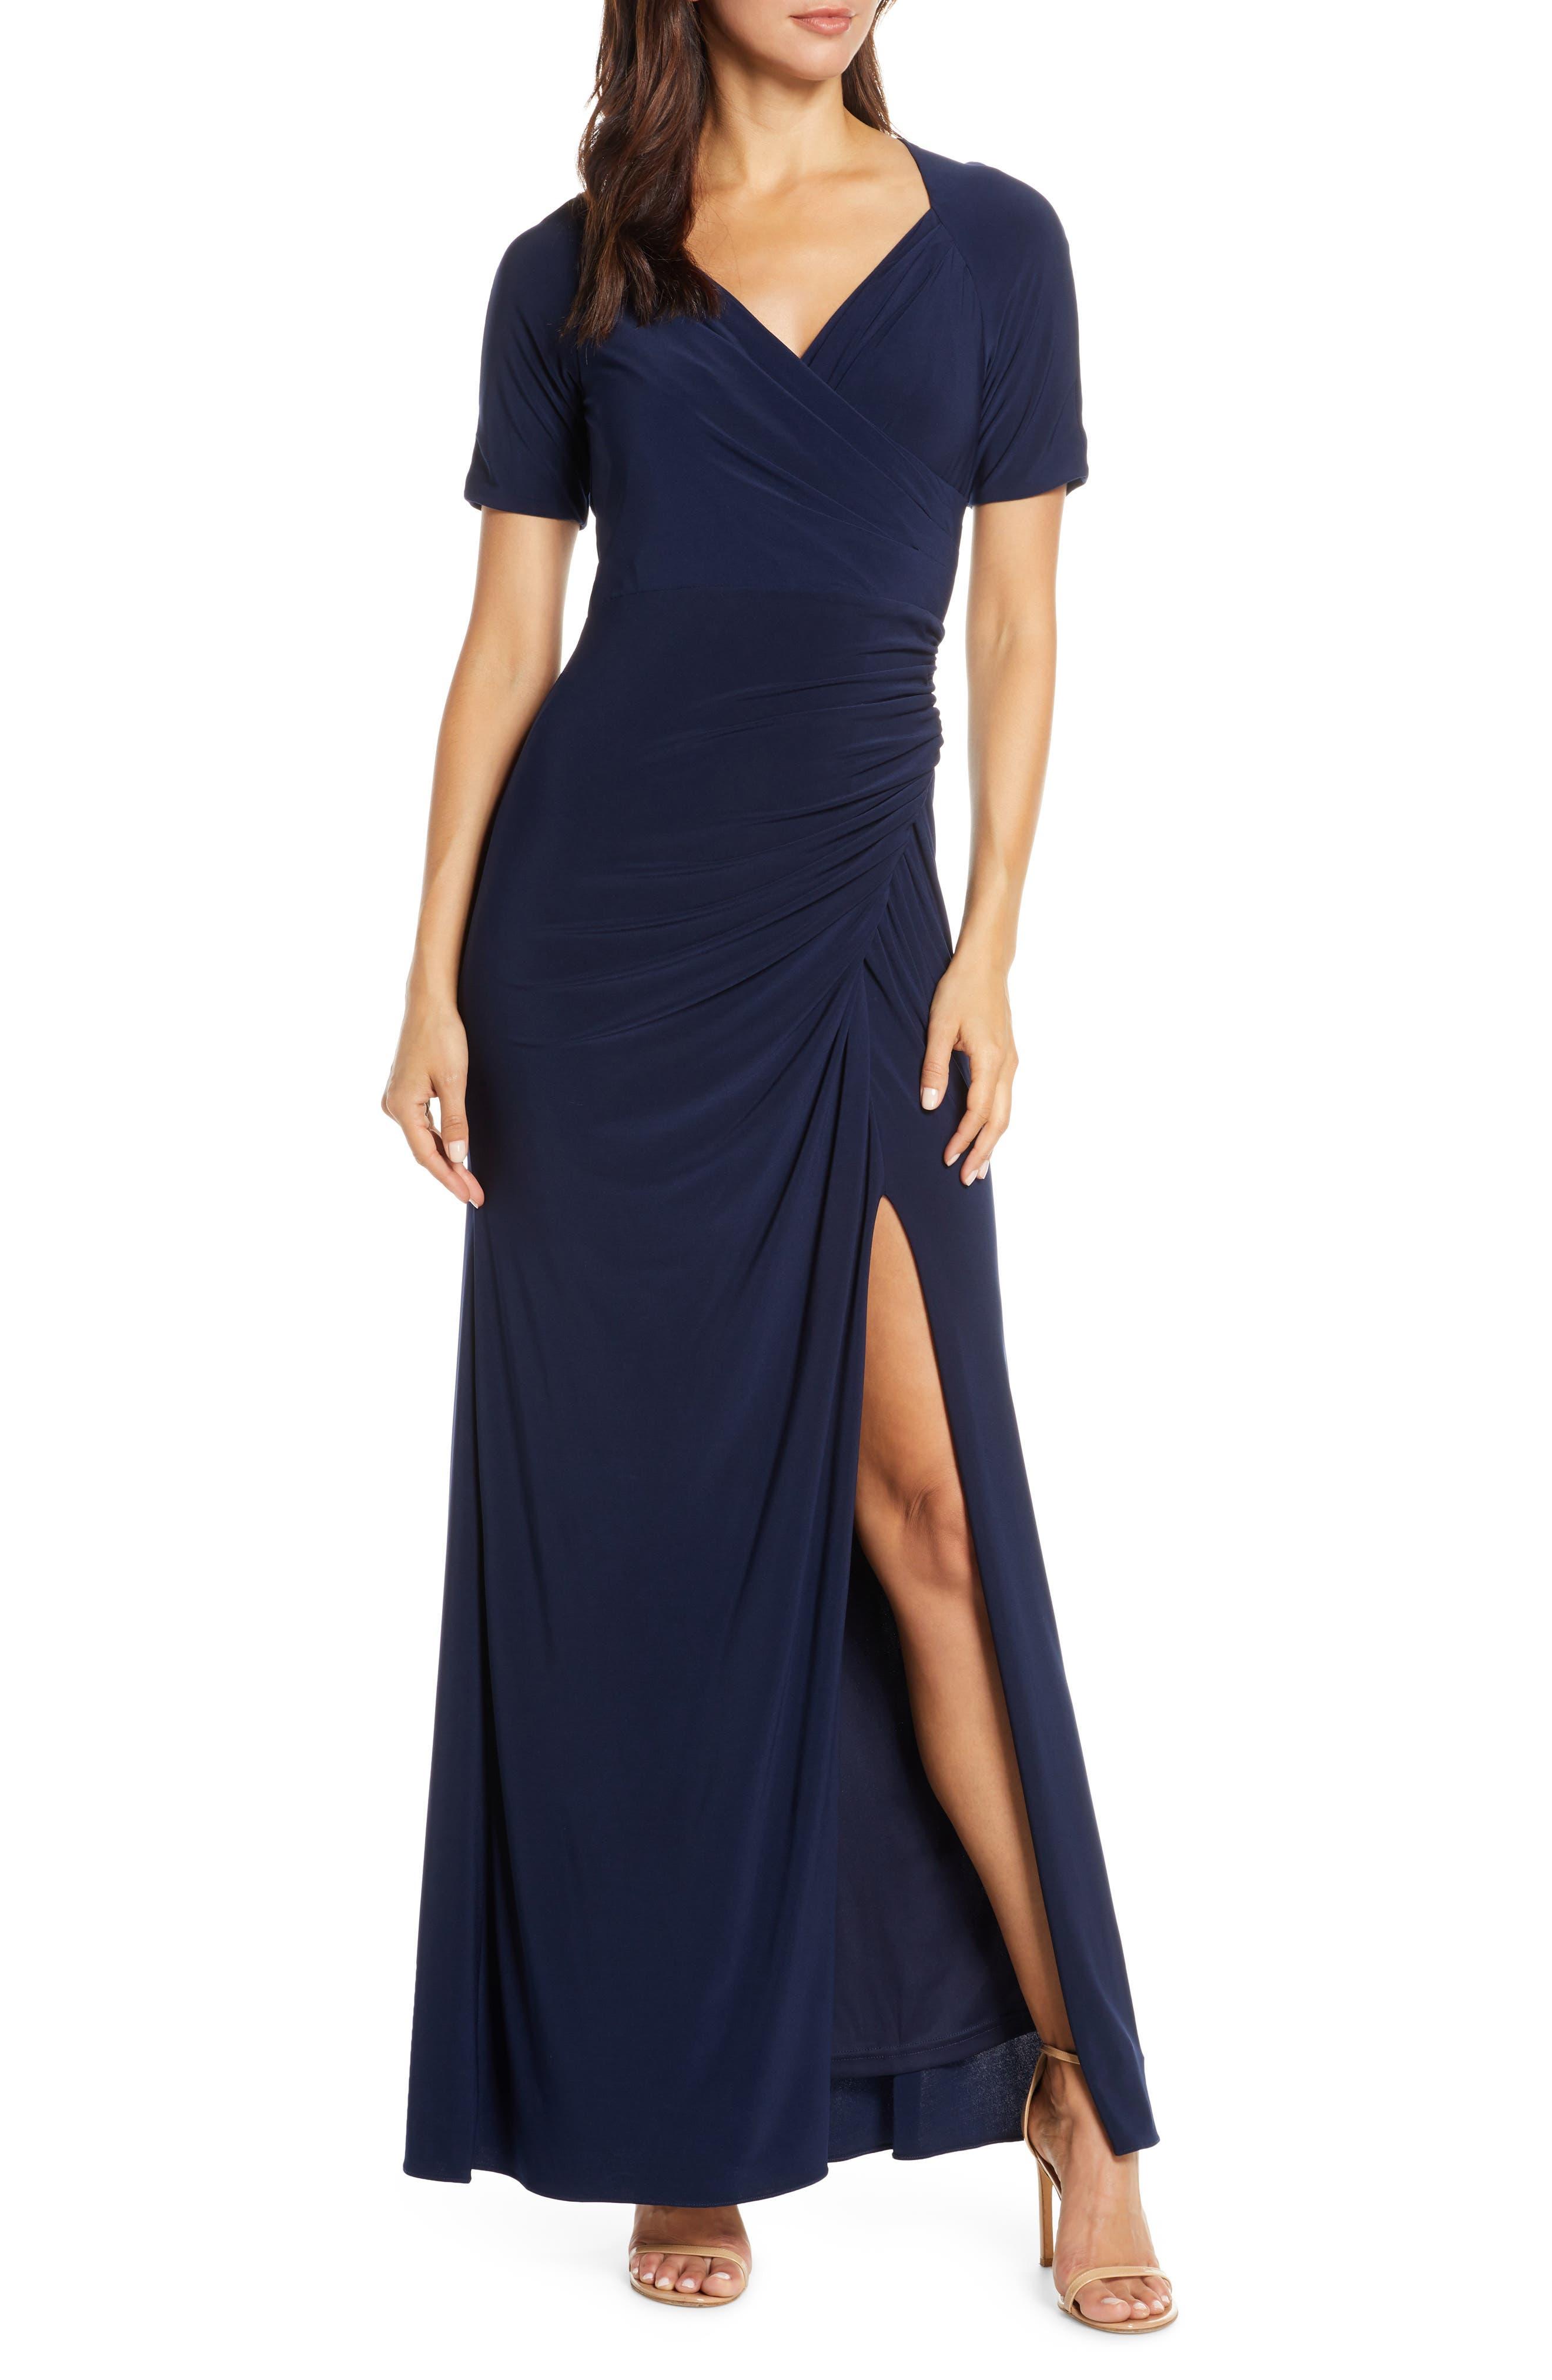 5faae39f60b Adrianna Papell Dresses